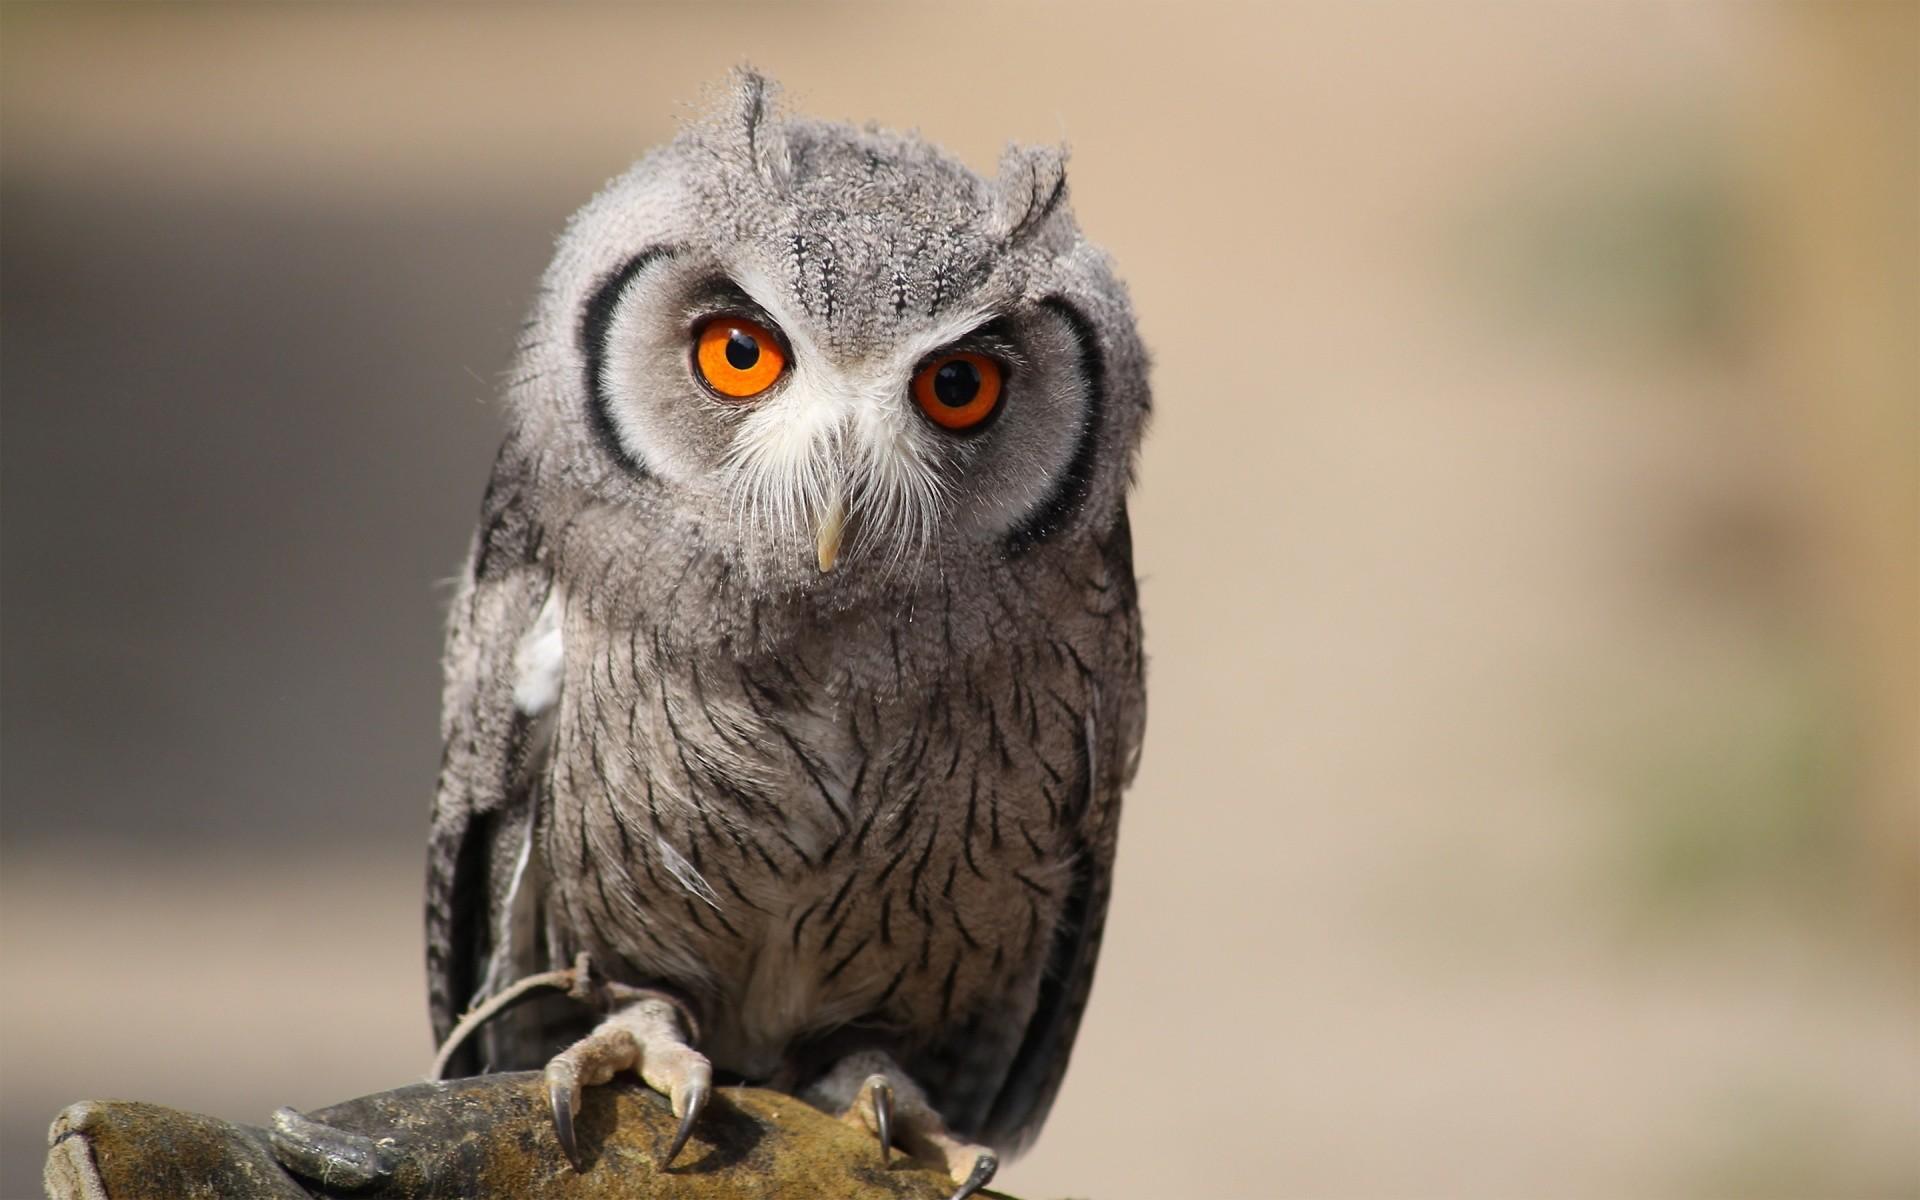 Eurasian scops owl Wallpaper in 1920×1200